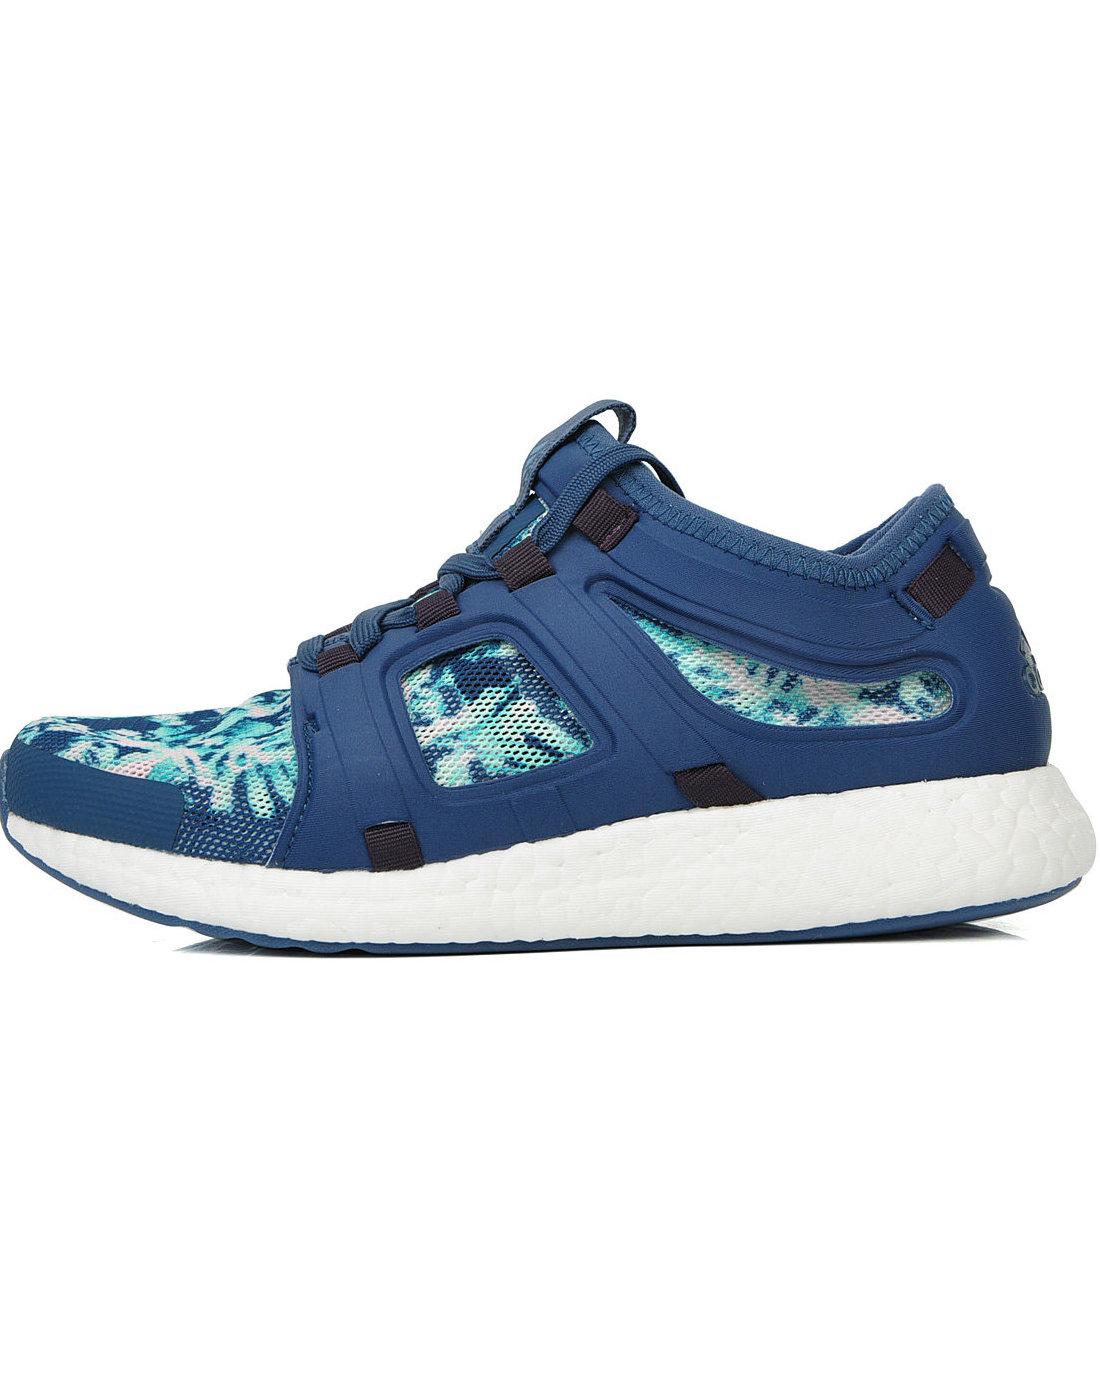 newest 1cfd0 d8648 Adidas-Chaussures-de-course-Running-Shoes-Femme-Blue-